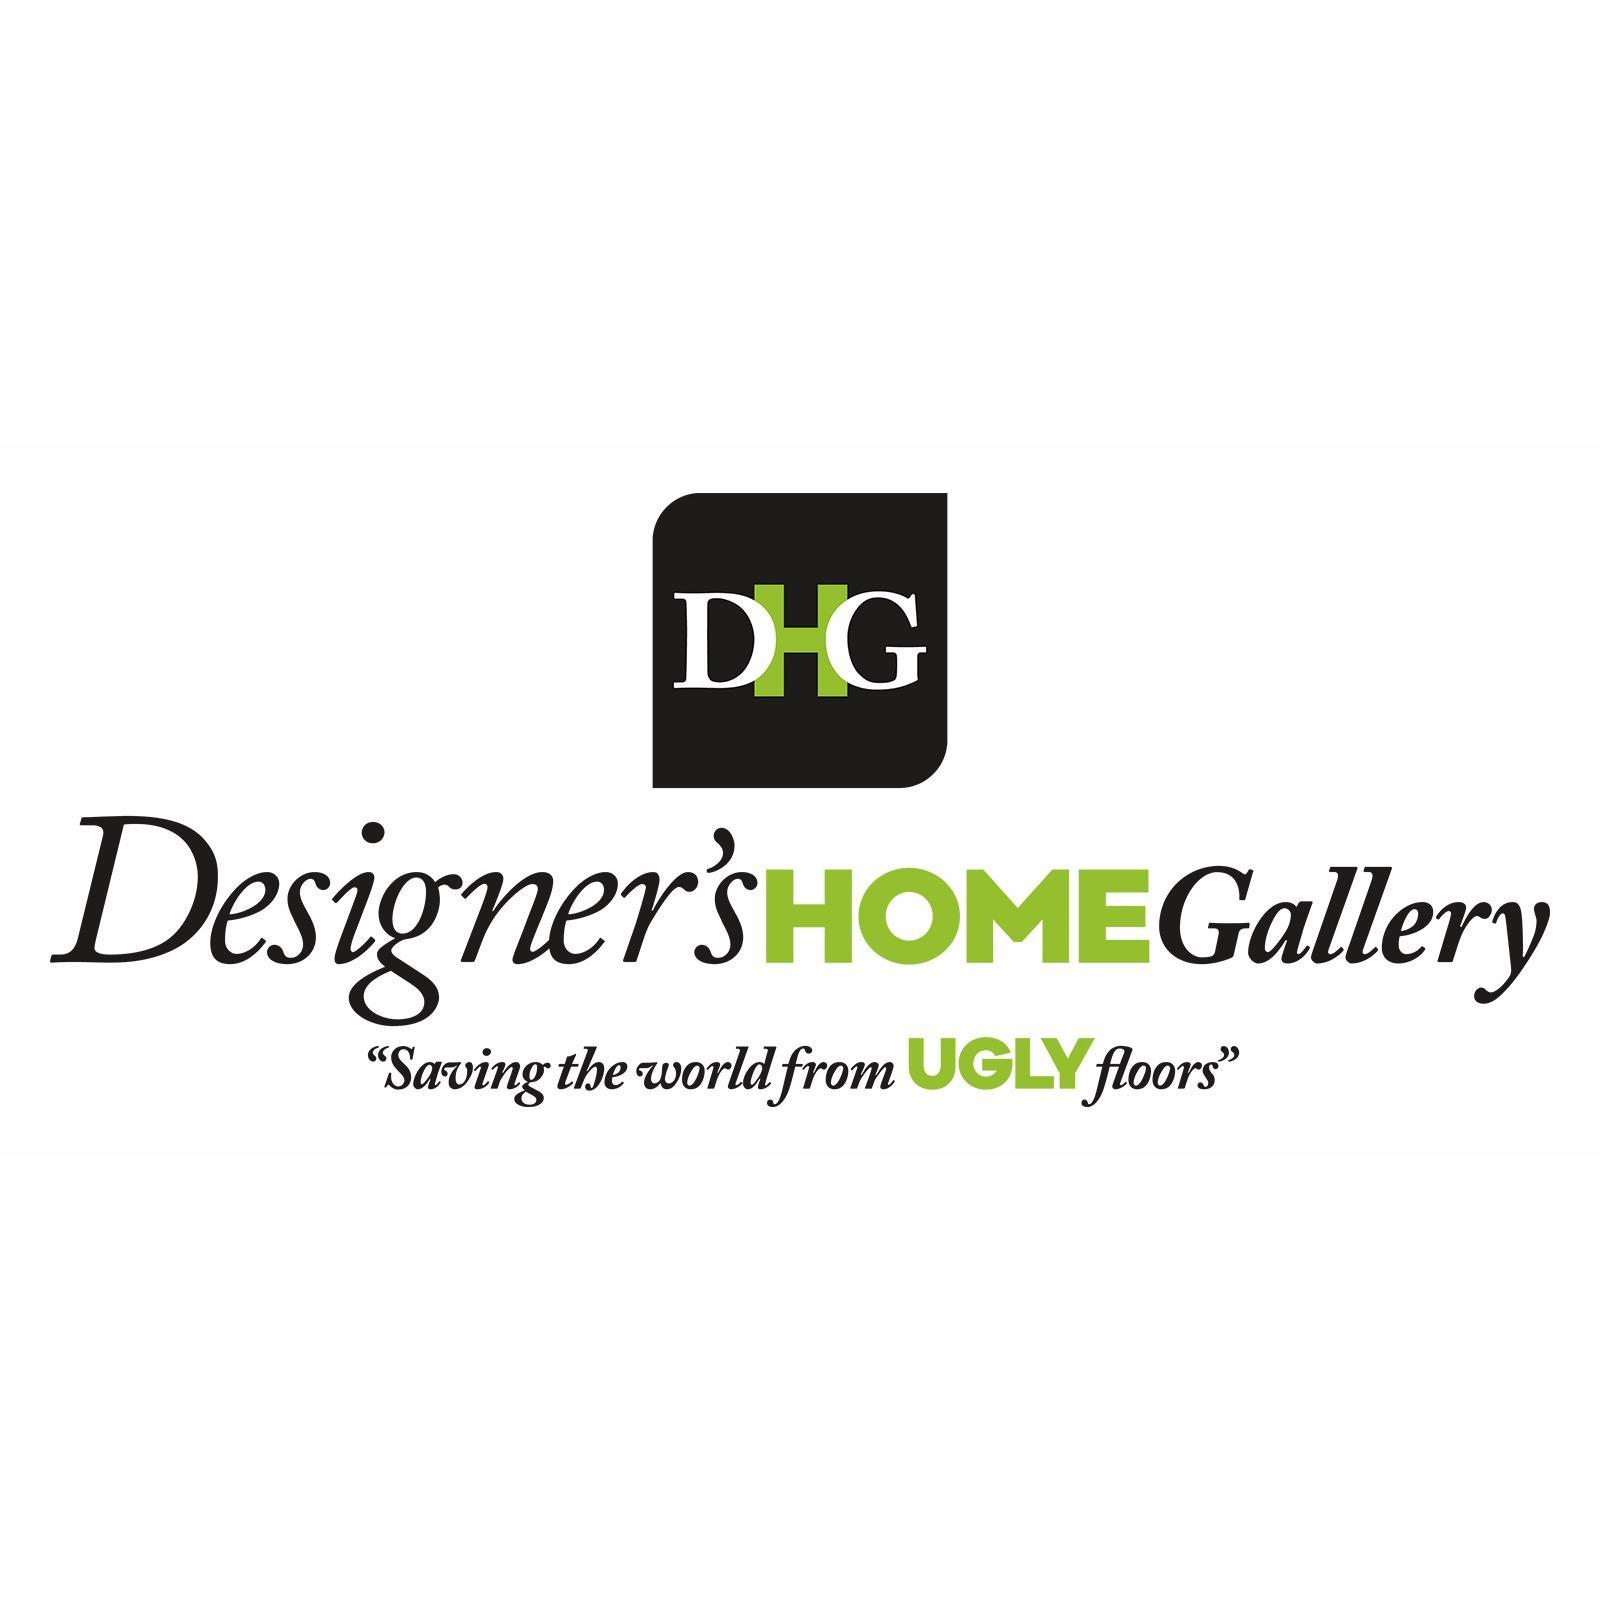 Wichita Ks Designers Home Gallery Find Designers Home Gallery In